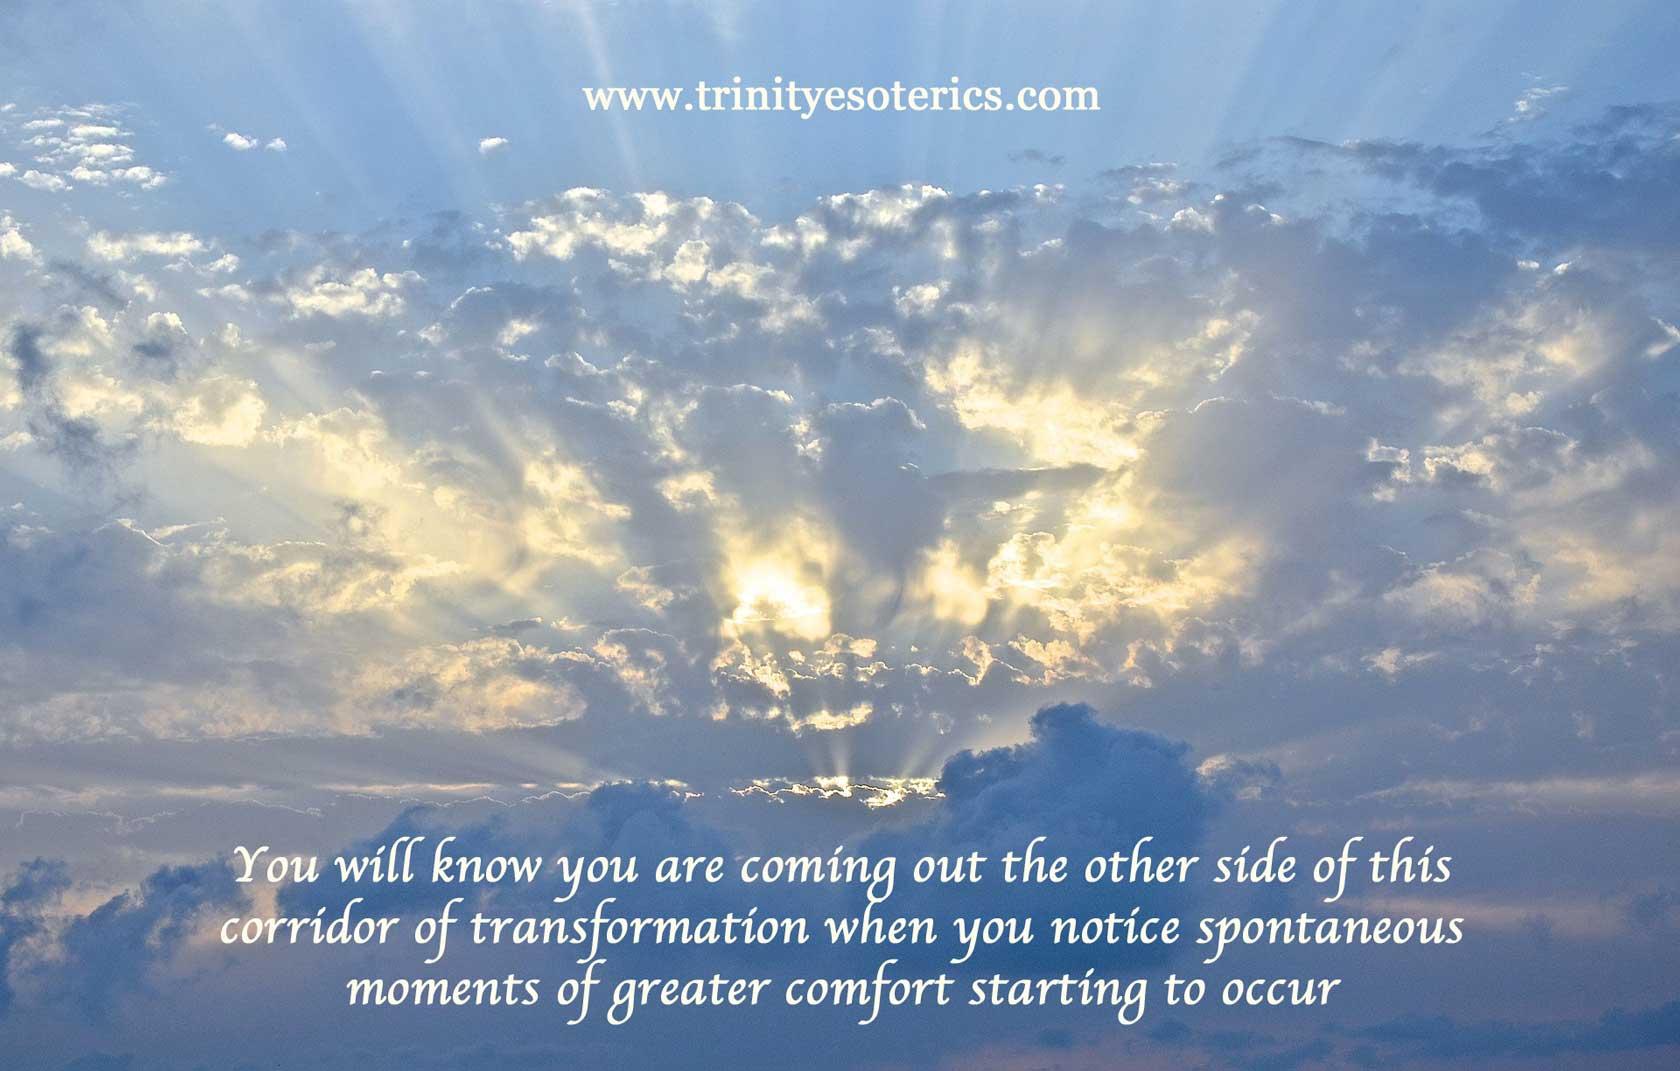 light breaking through clouds trinity esoterics